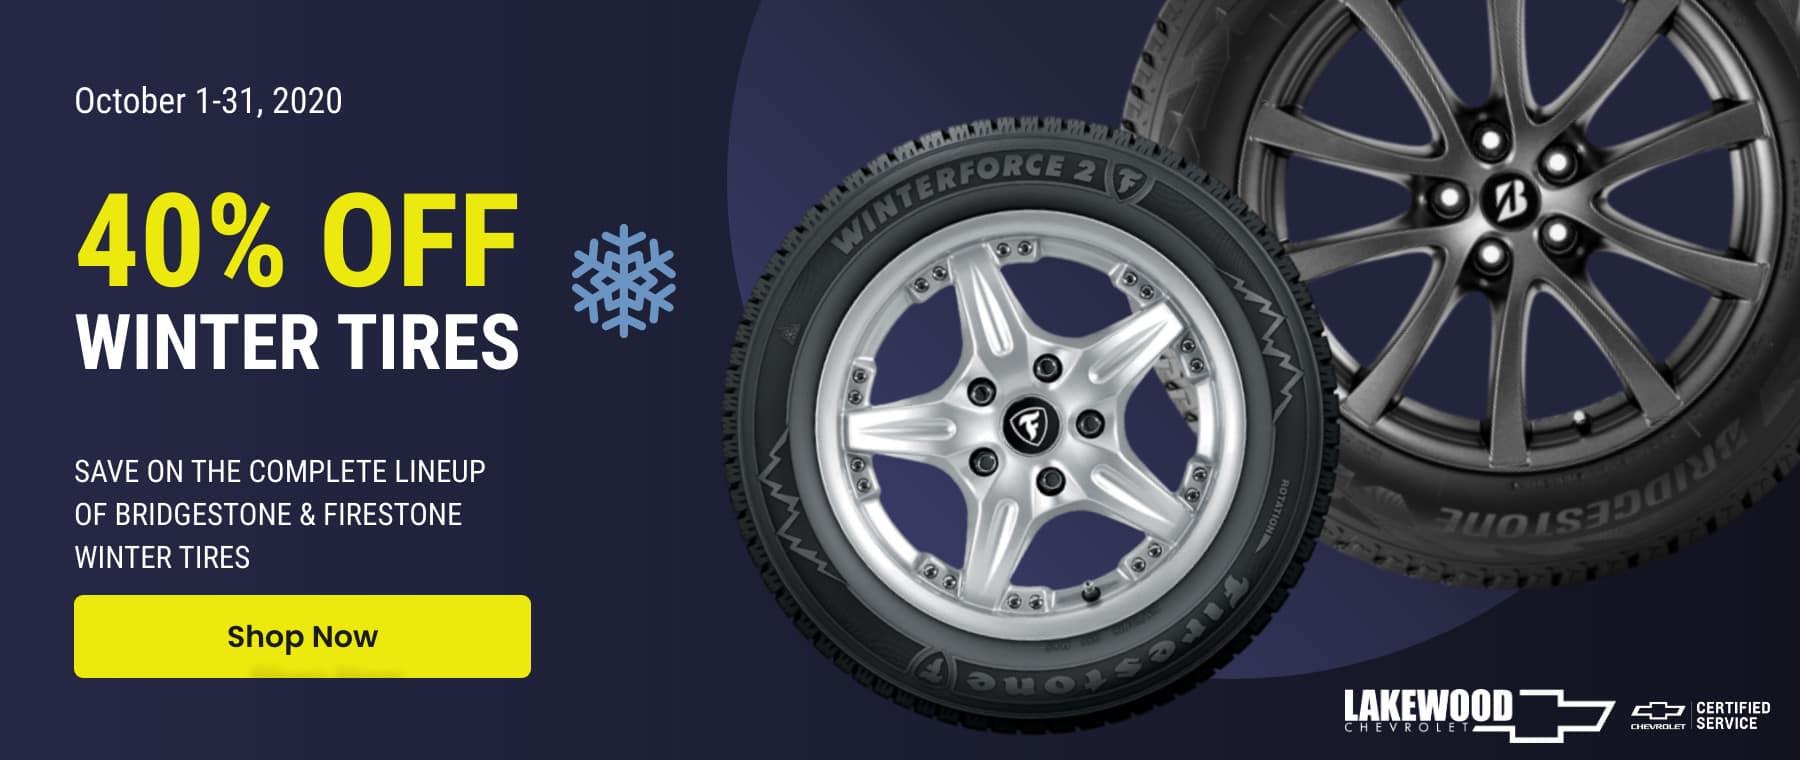 Lakewood Chevrolet - Winter Tires - October